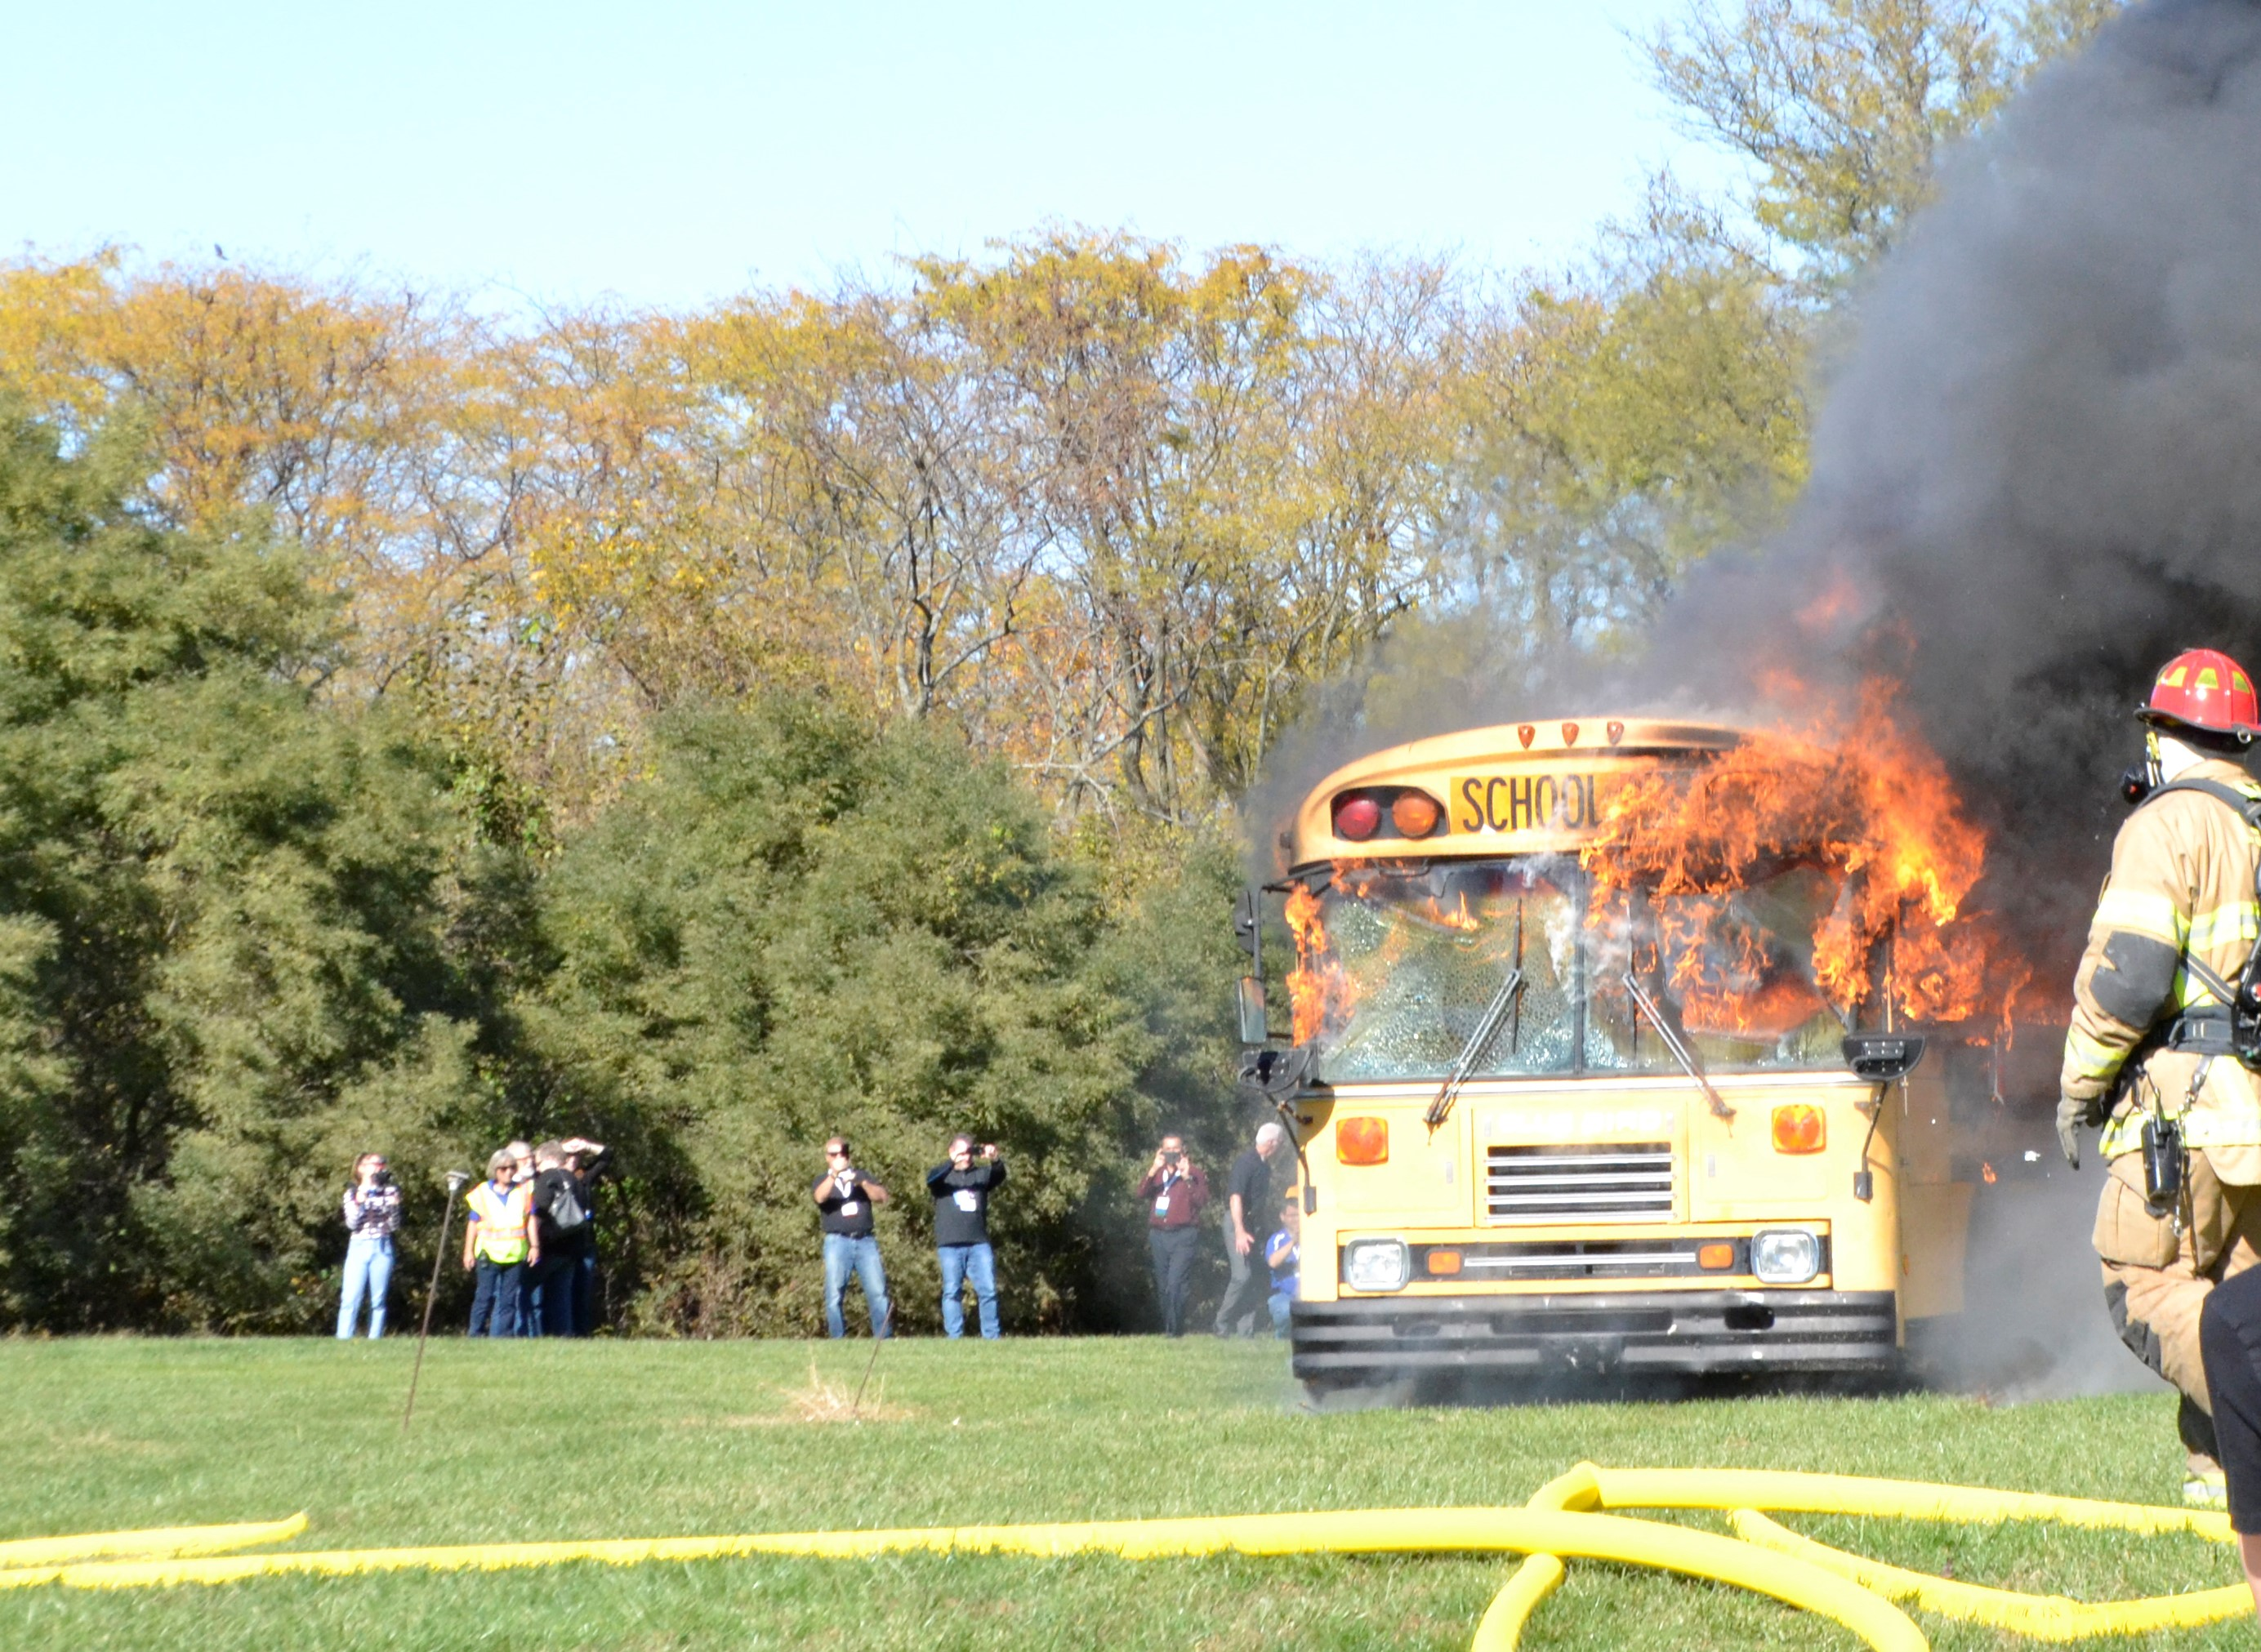 School Bus Fire Demo Shows Importance of Evacuation Training